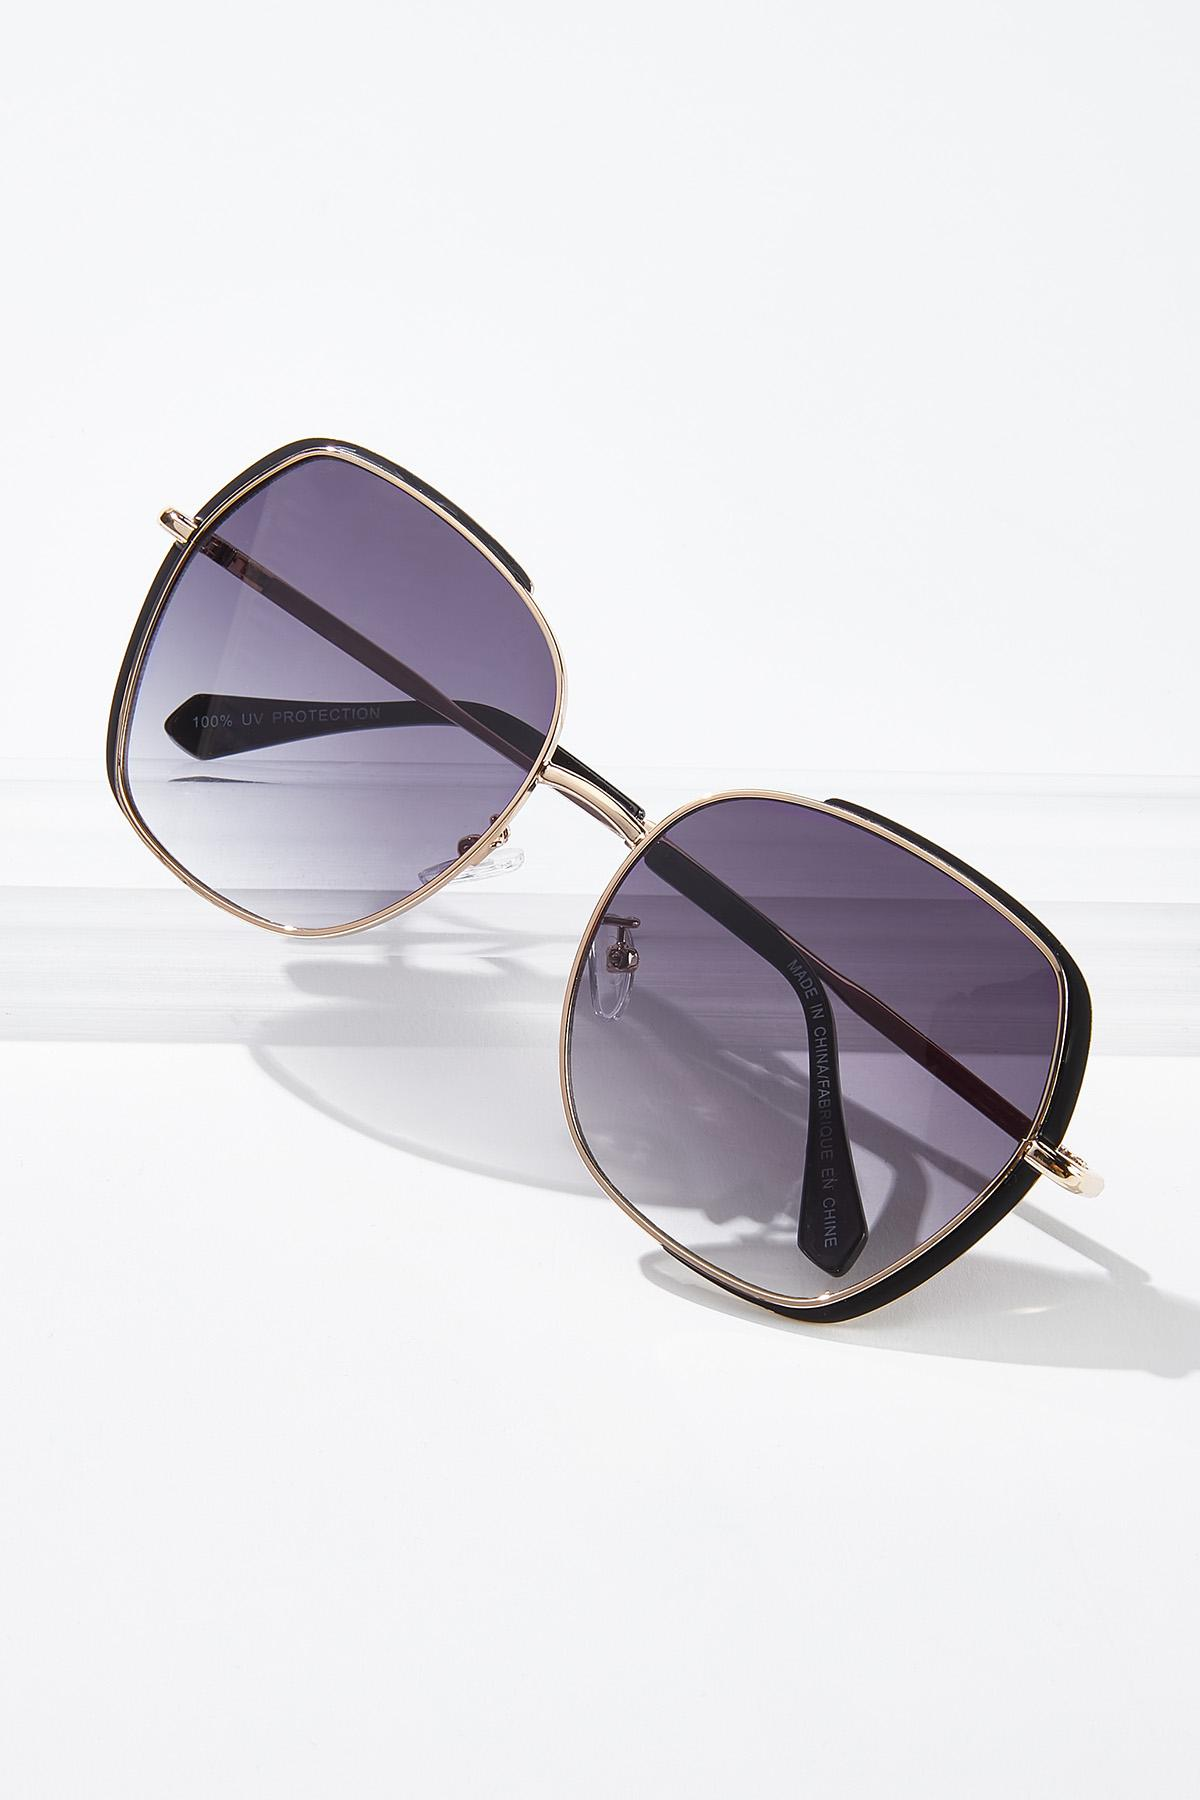 Black Gold Statement Sunglasses